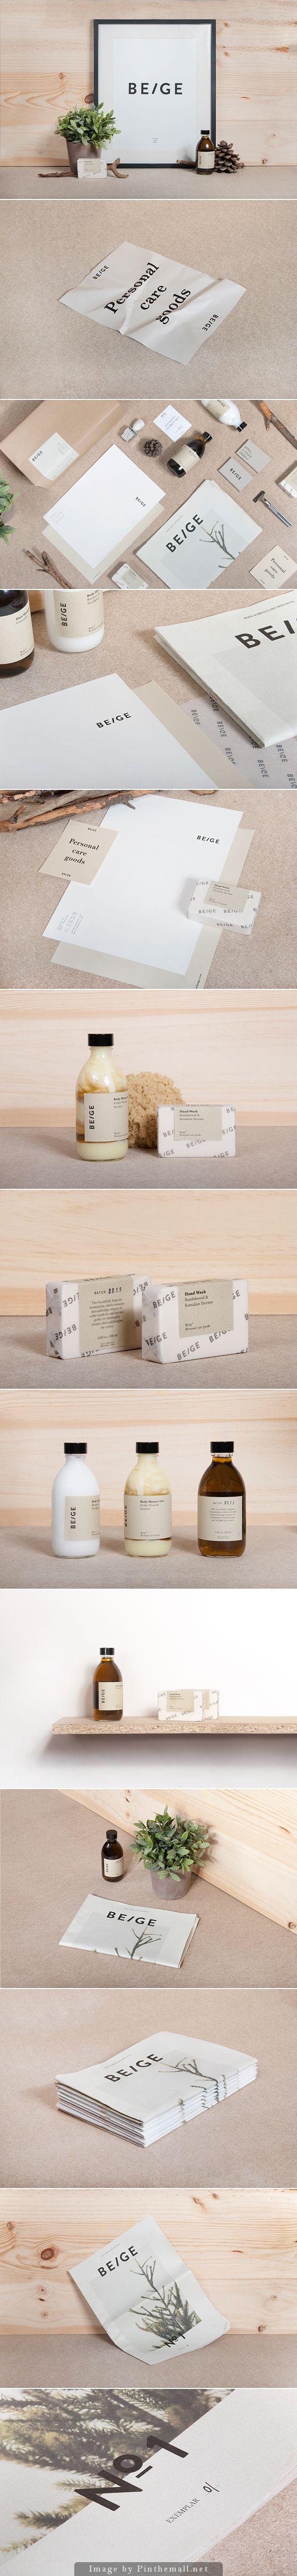 BEIGE Art Direction, Branding, Graphic Design